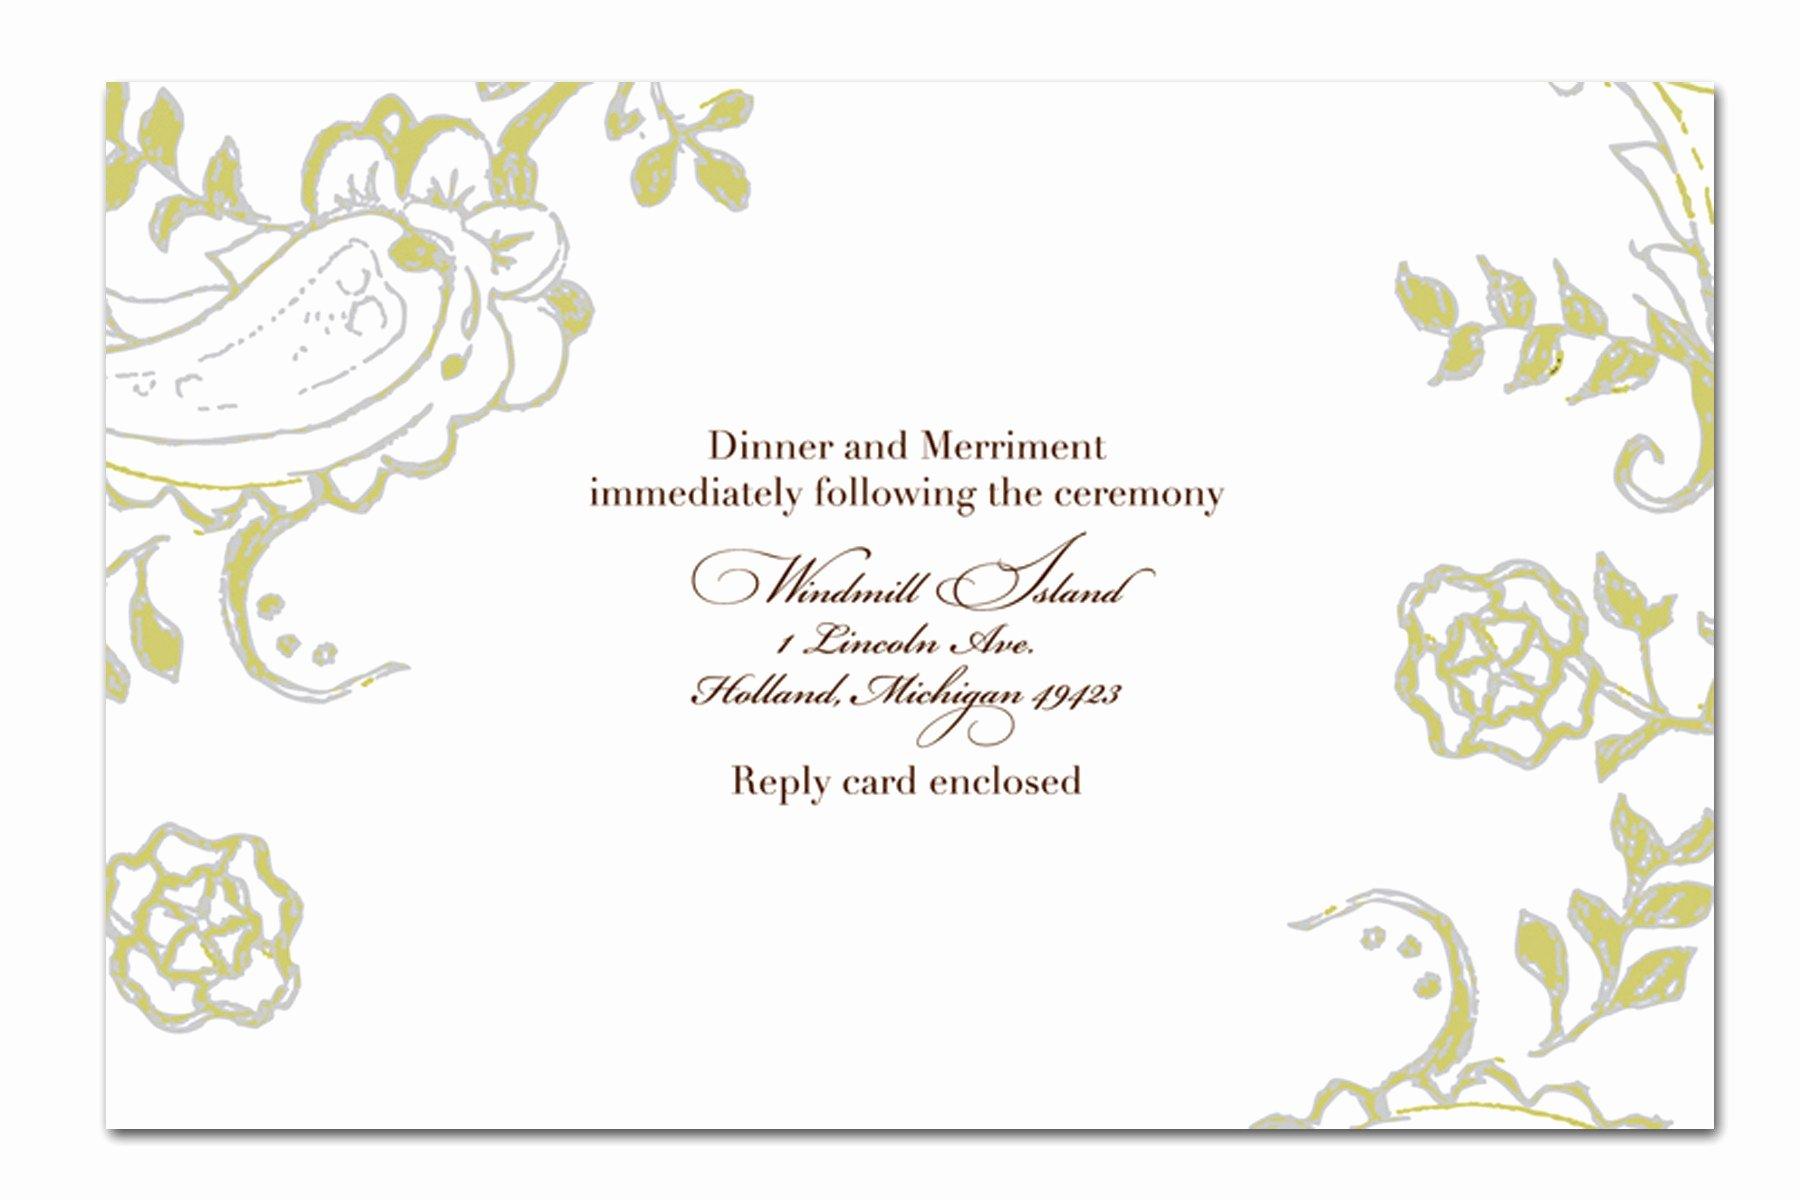 Wedding Invite Template Photoshop Fresh Wedding Invitation Templates Psd Shop Free Creative